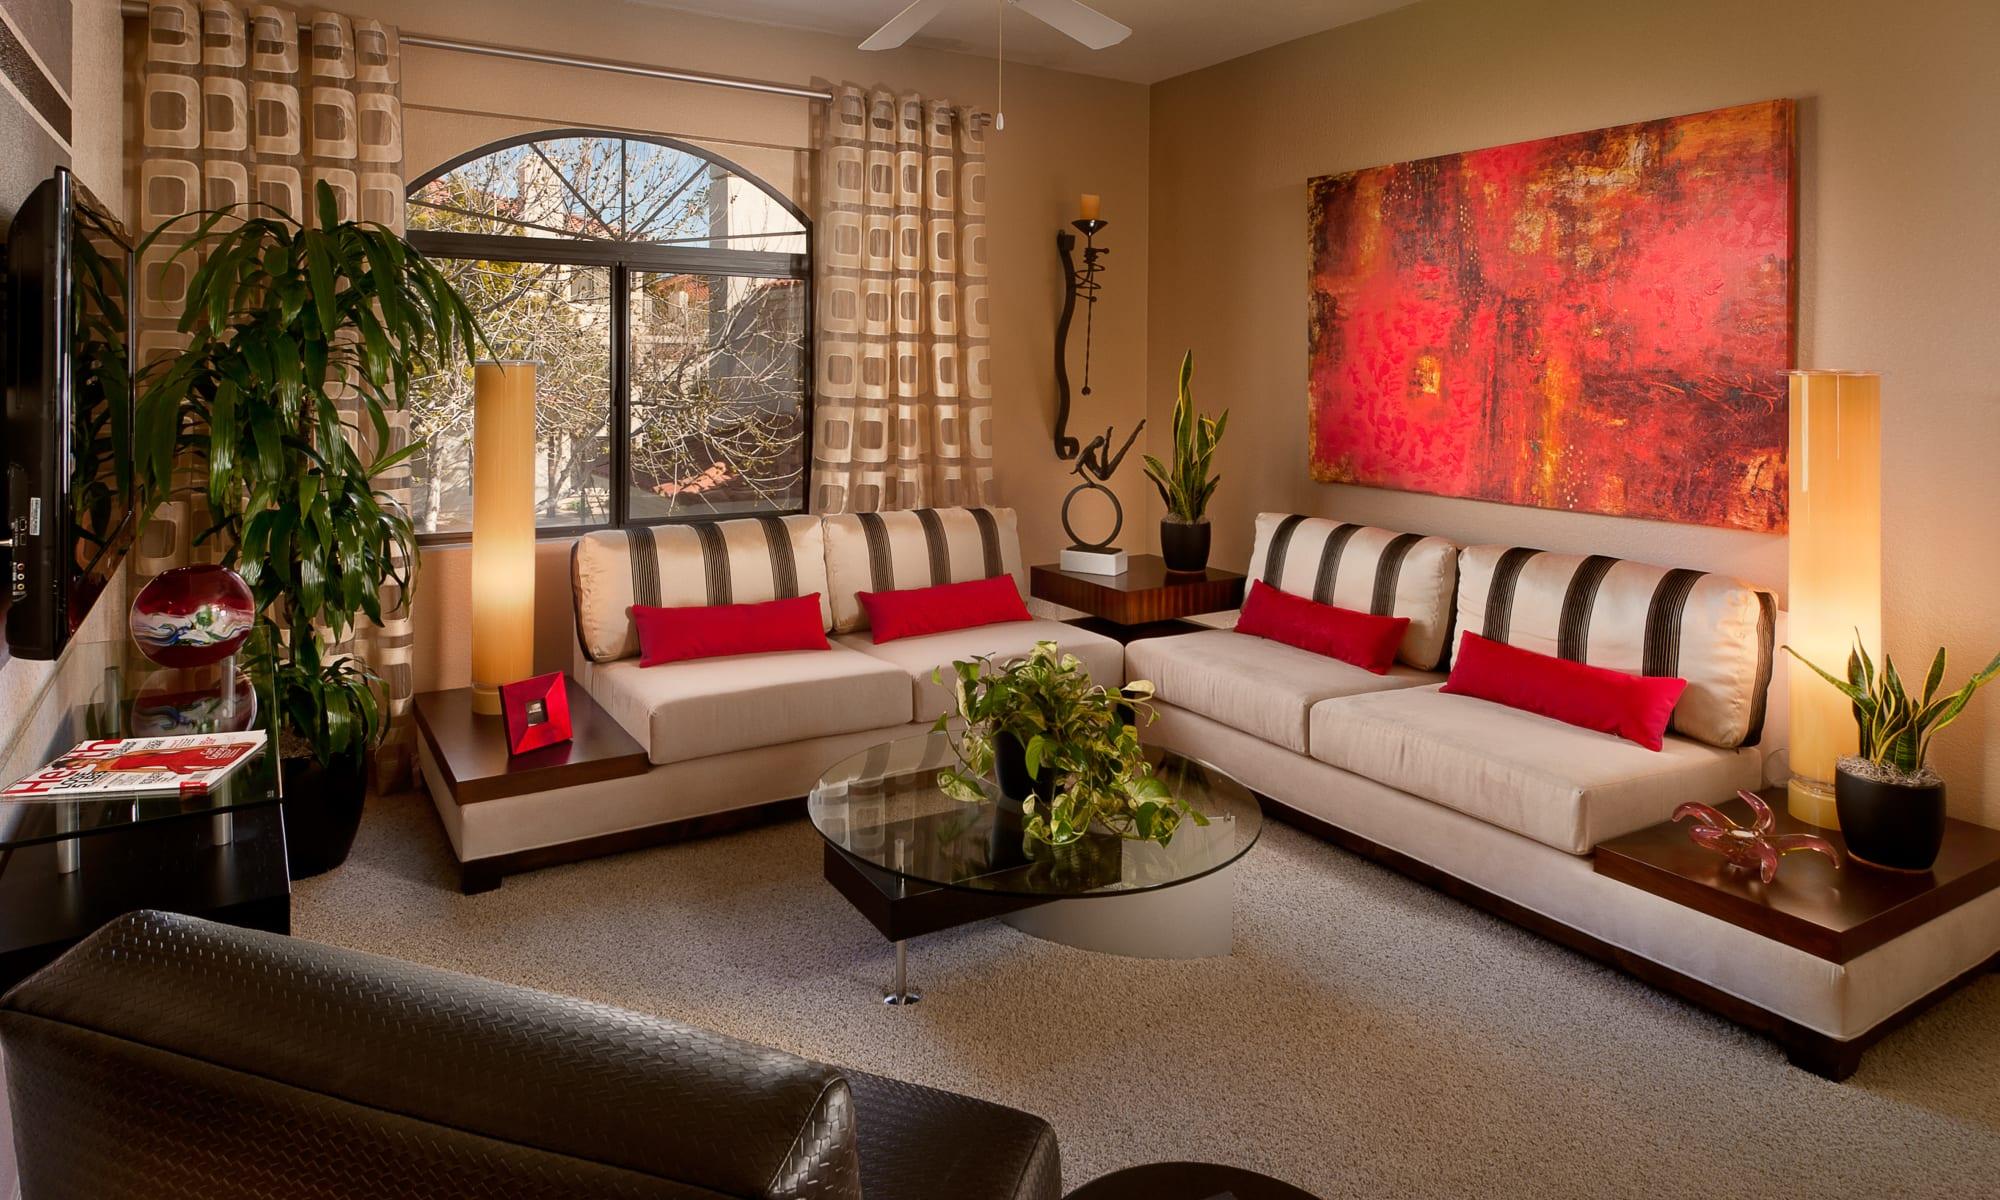 South Tempe, AZ Apartments in Maricopa County | San Palmilla